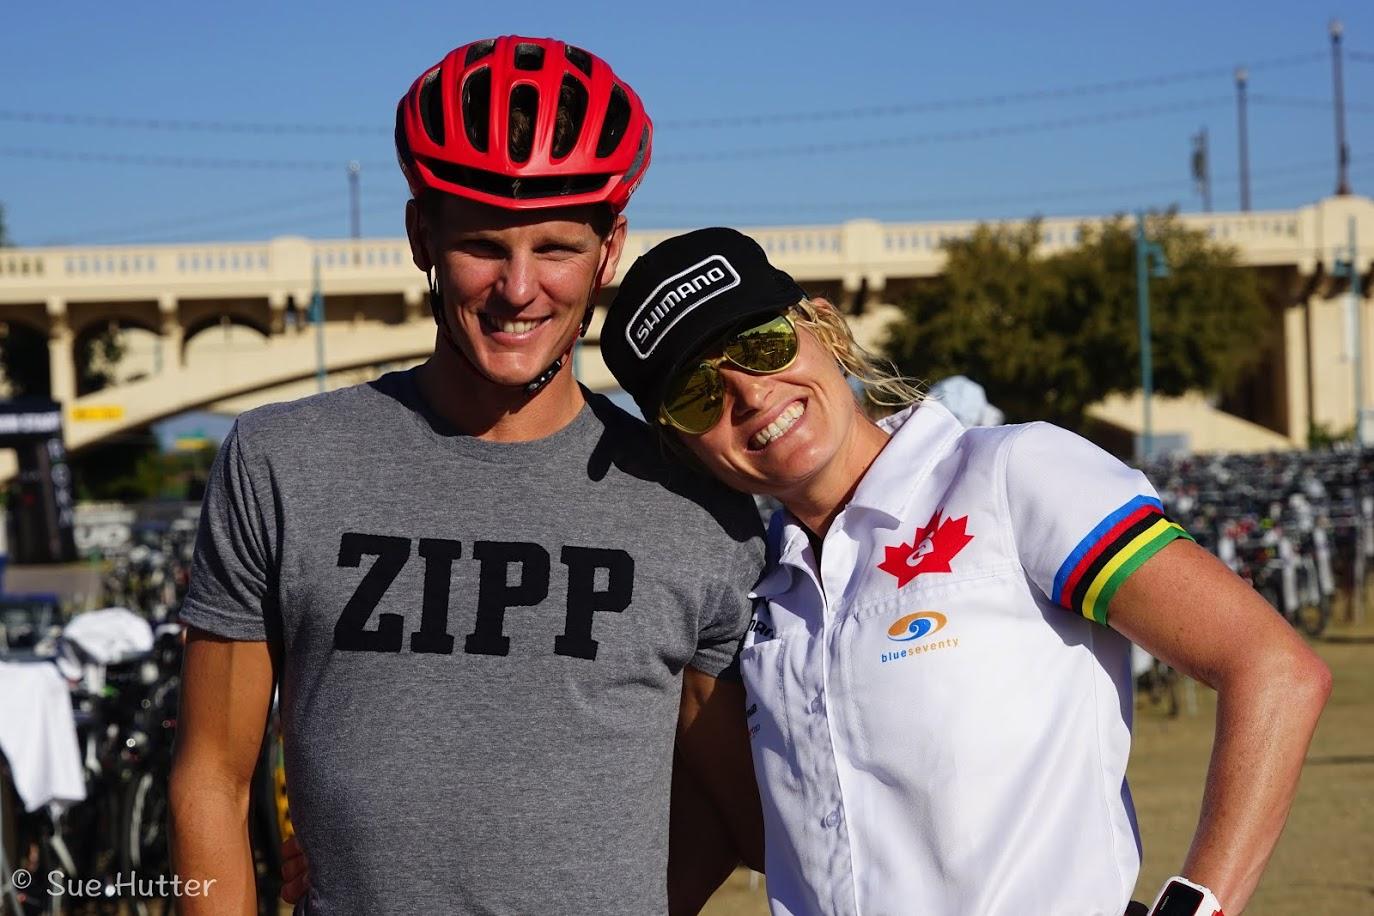 Professional triathletes Melanie Mcquaid and Brent Mcmahon